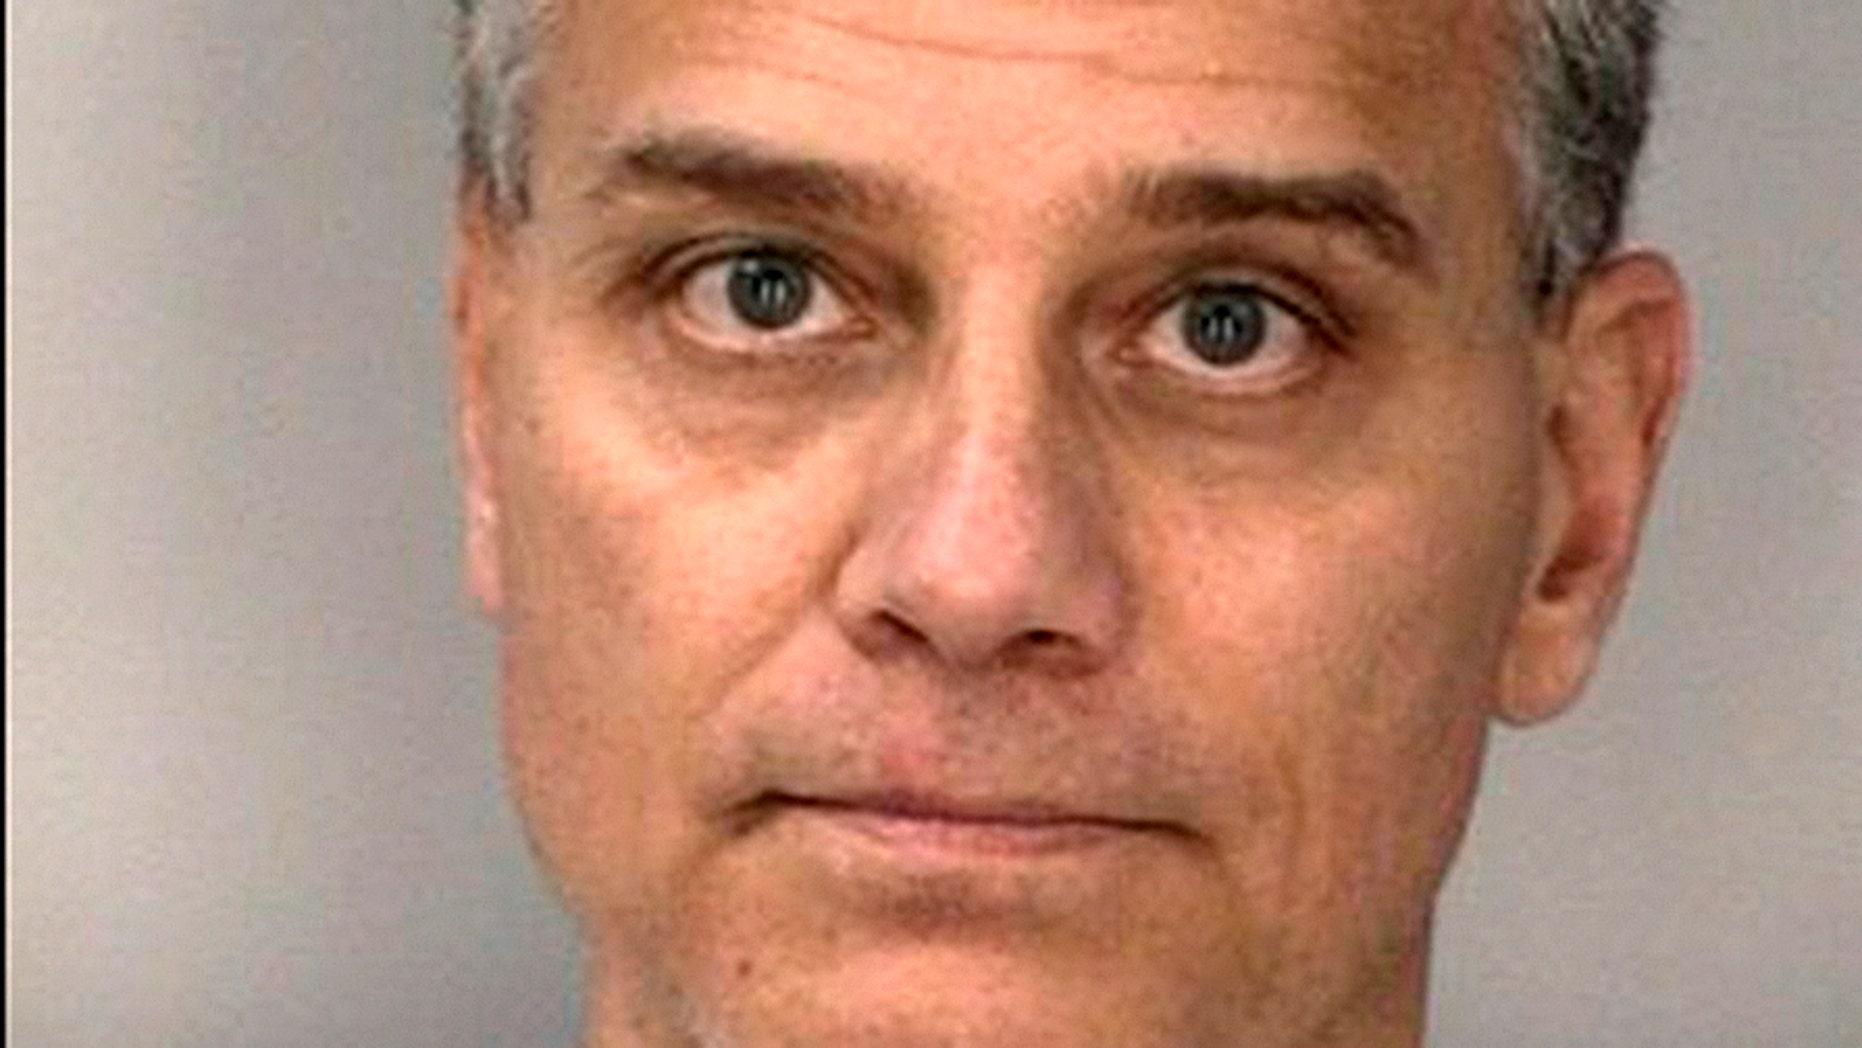 Stephen Lorenzo is accused of killing two men.